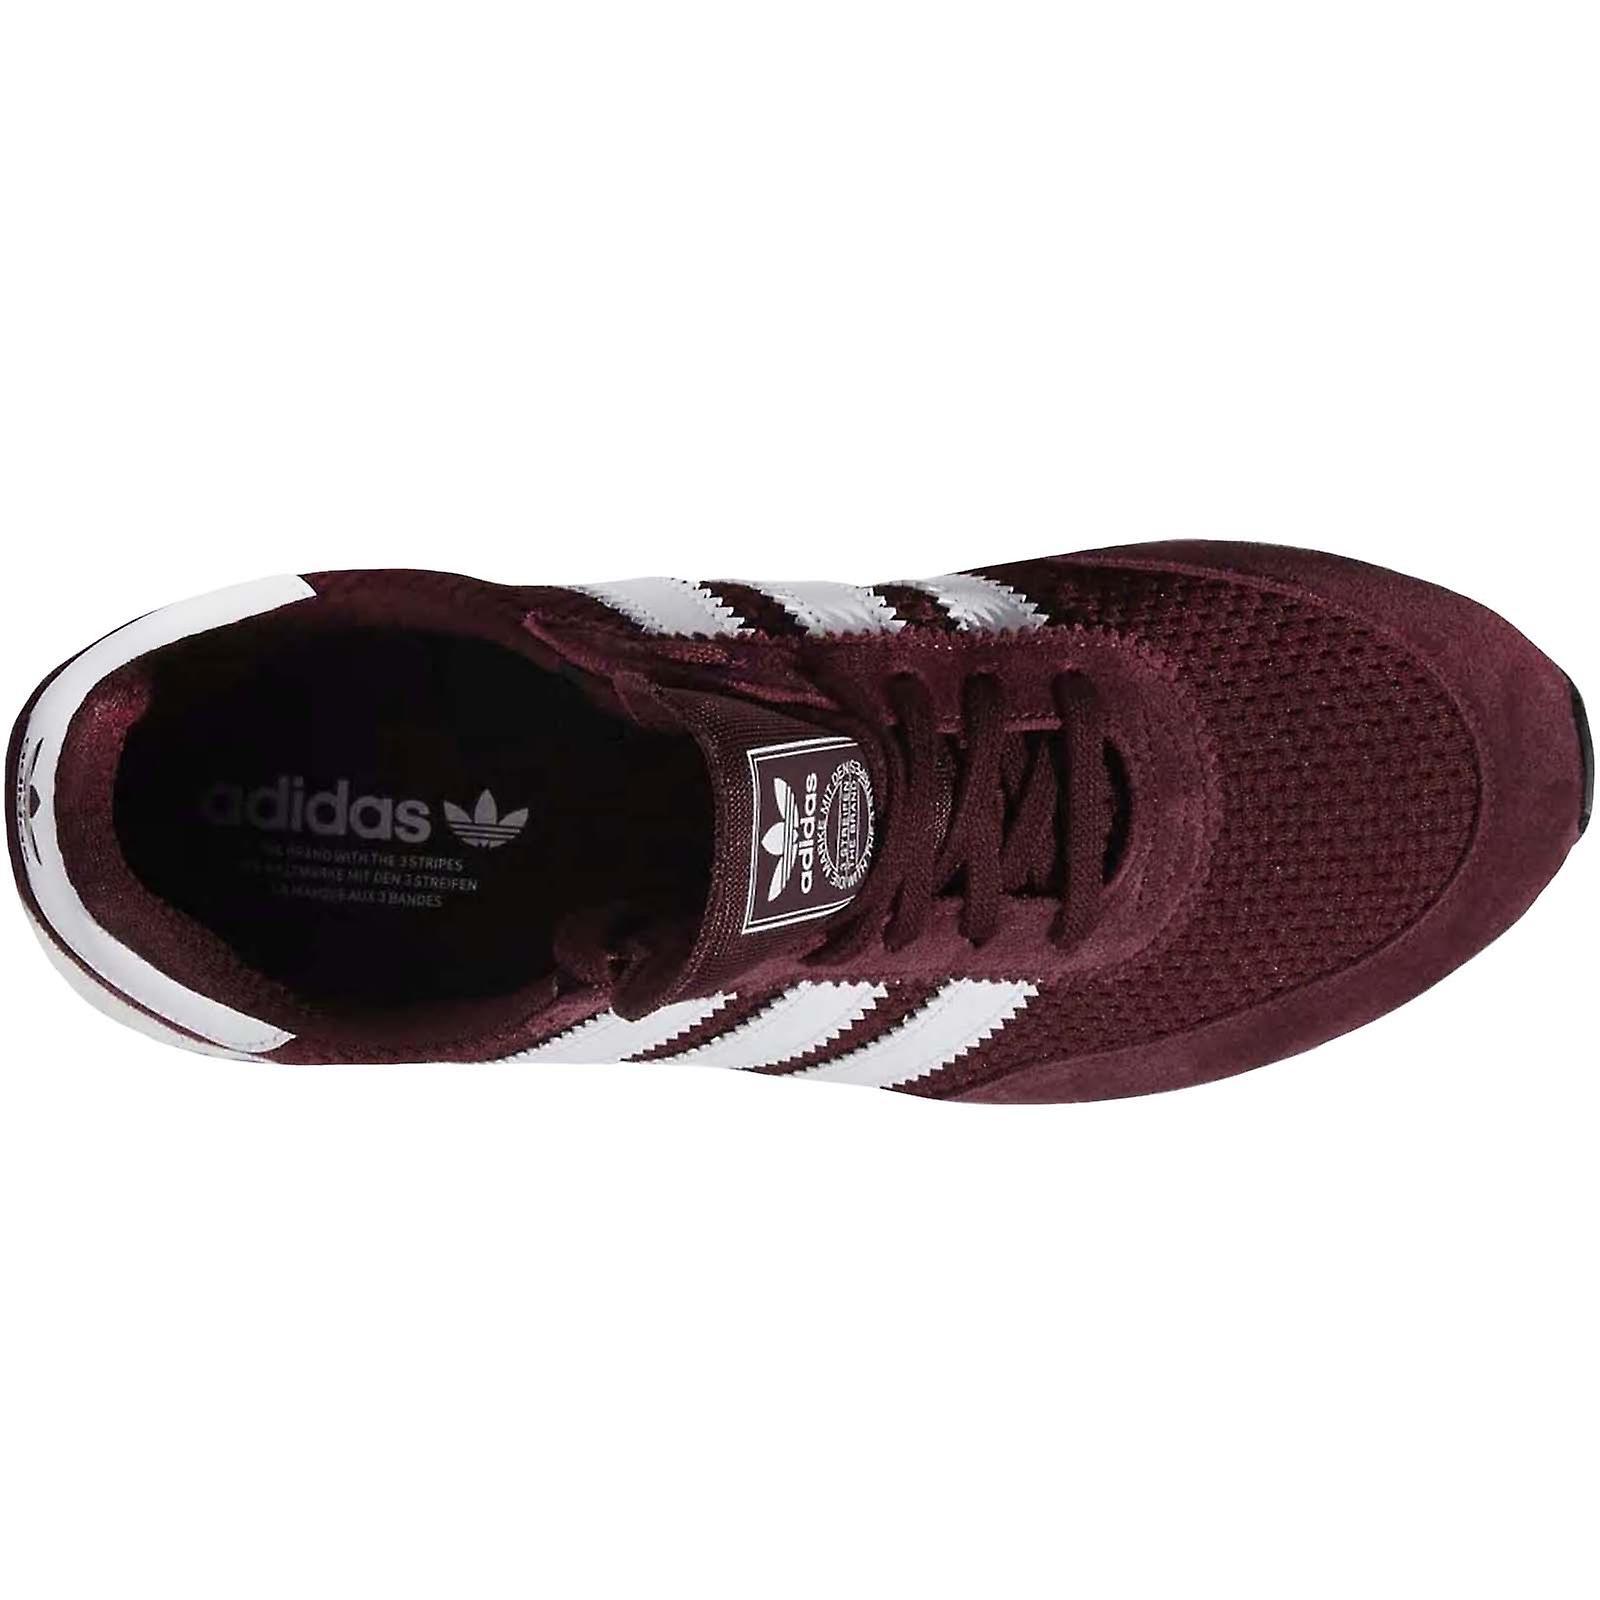 adidas Originals I 5923 Herren Mode Schnürschuhe Maroon